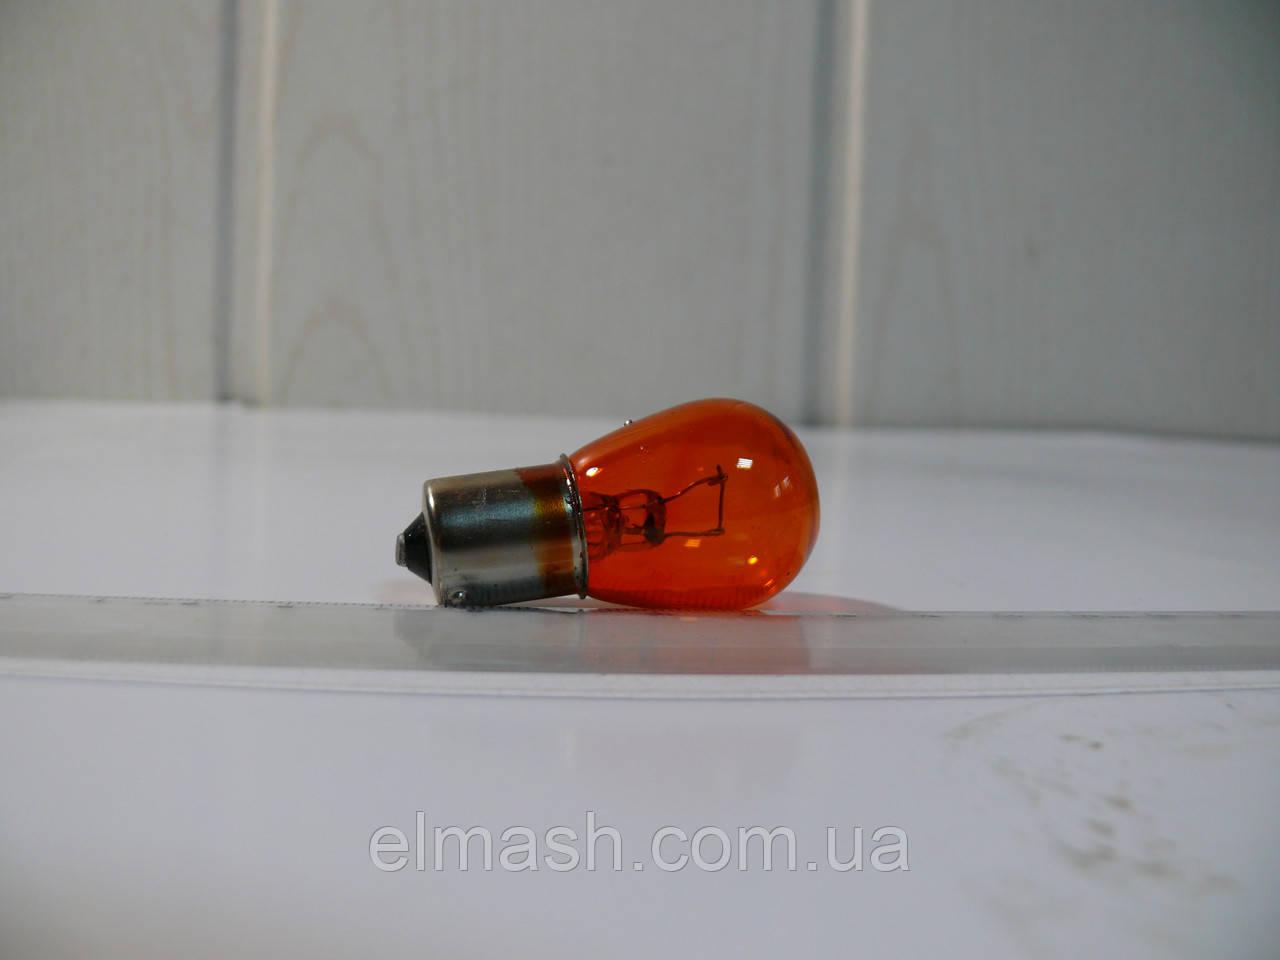 Лампа 24V PY21W 21W BAU15s AMBER HEAVY DUTY (пр-во Narva)